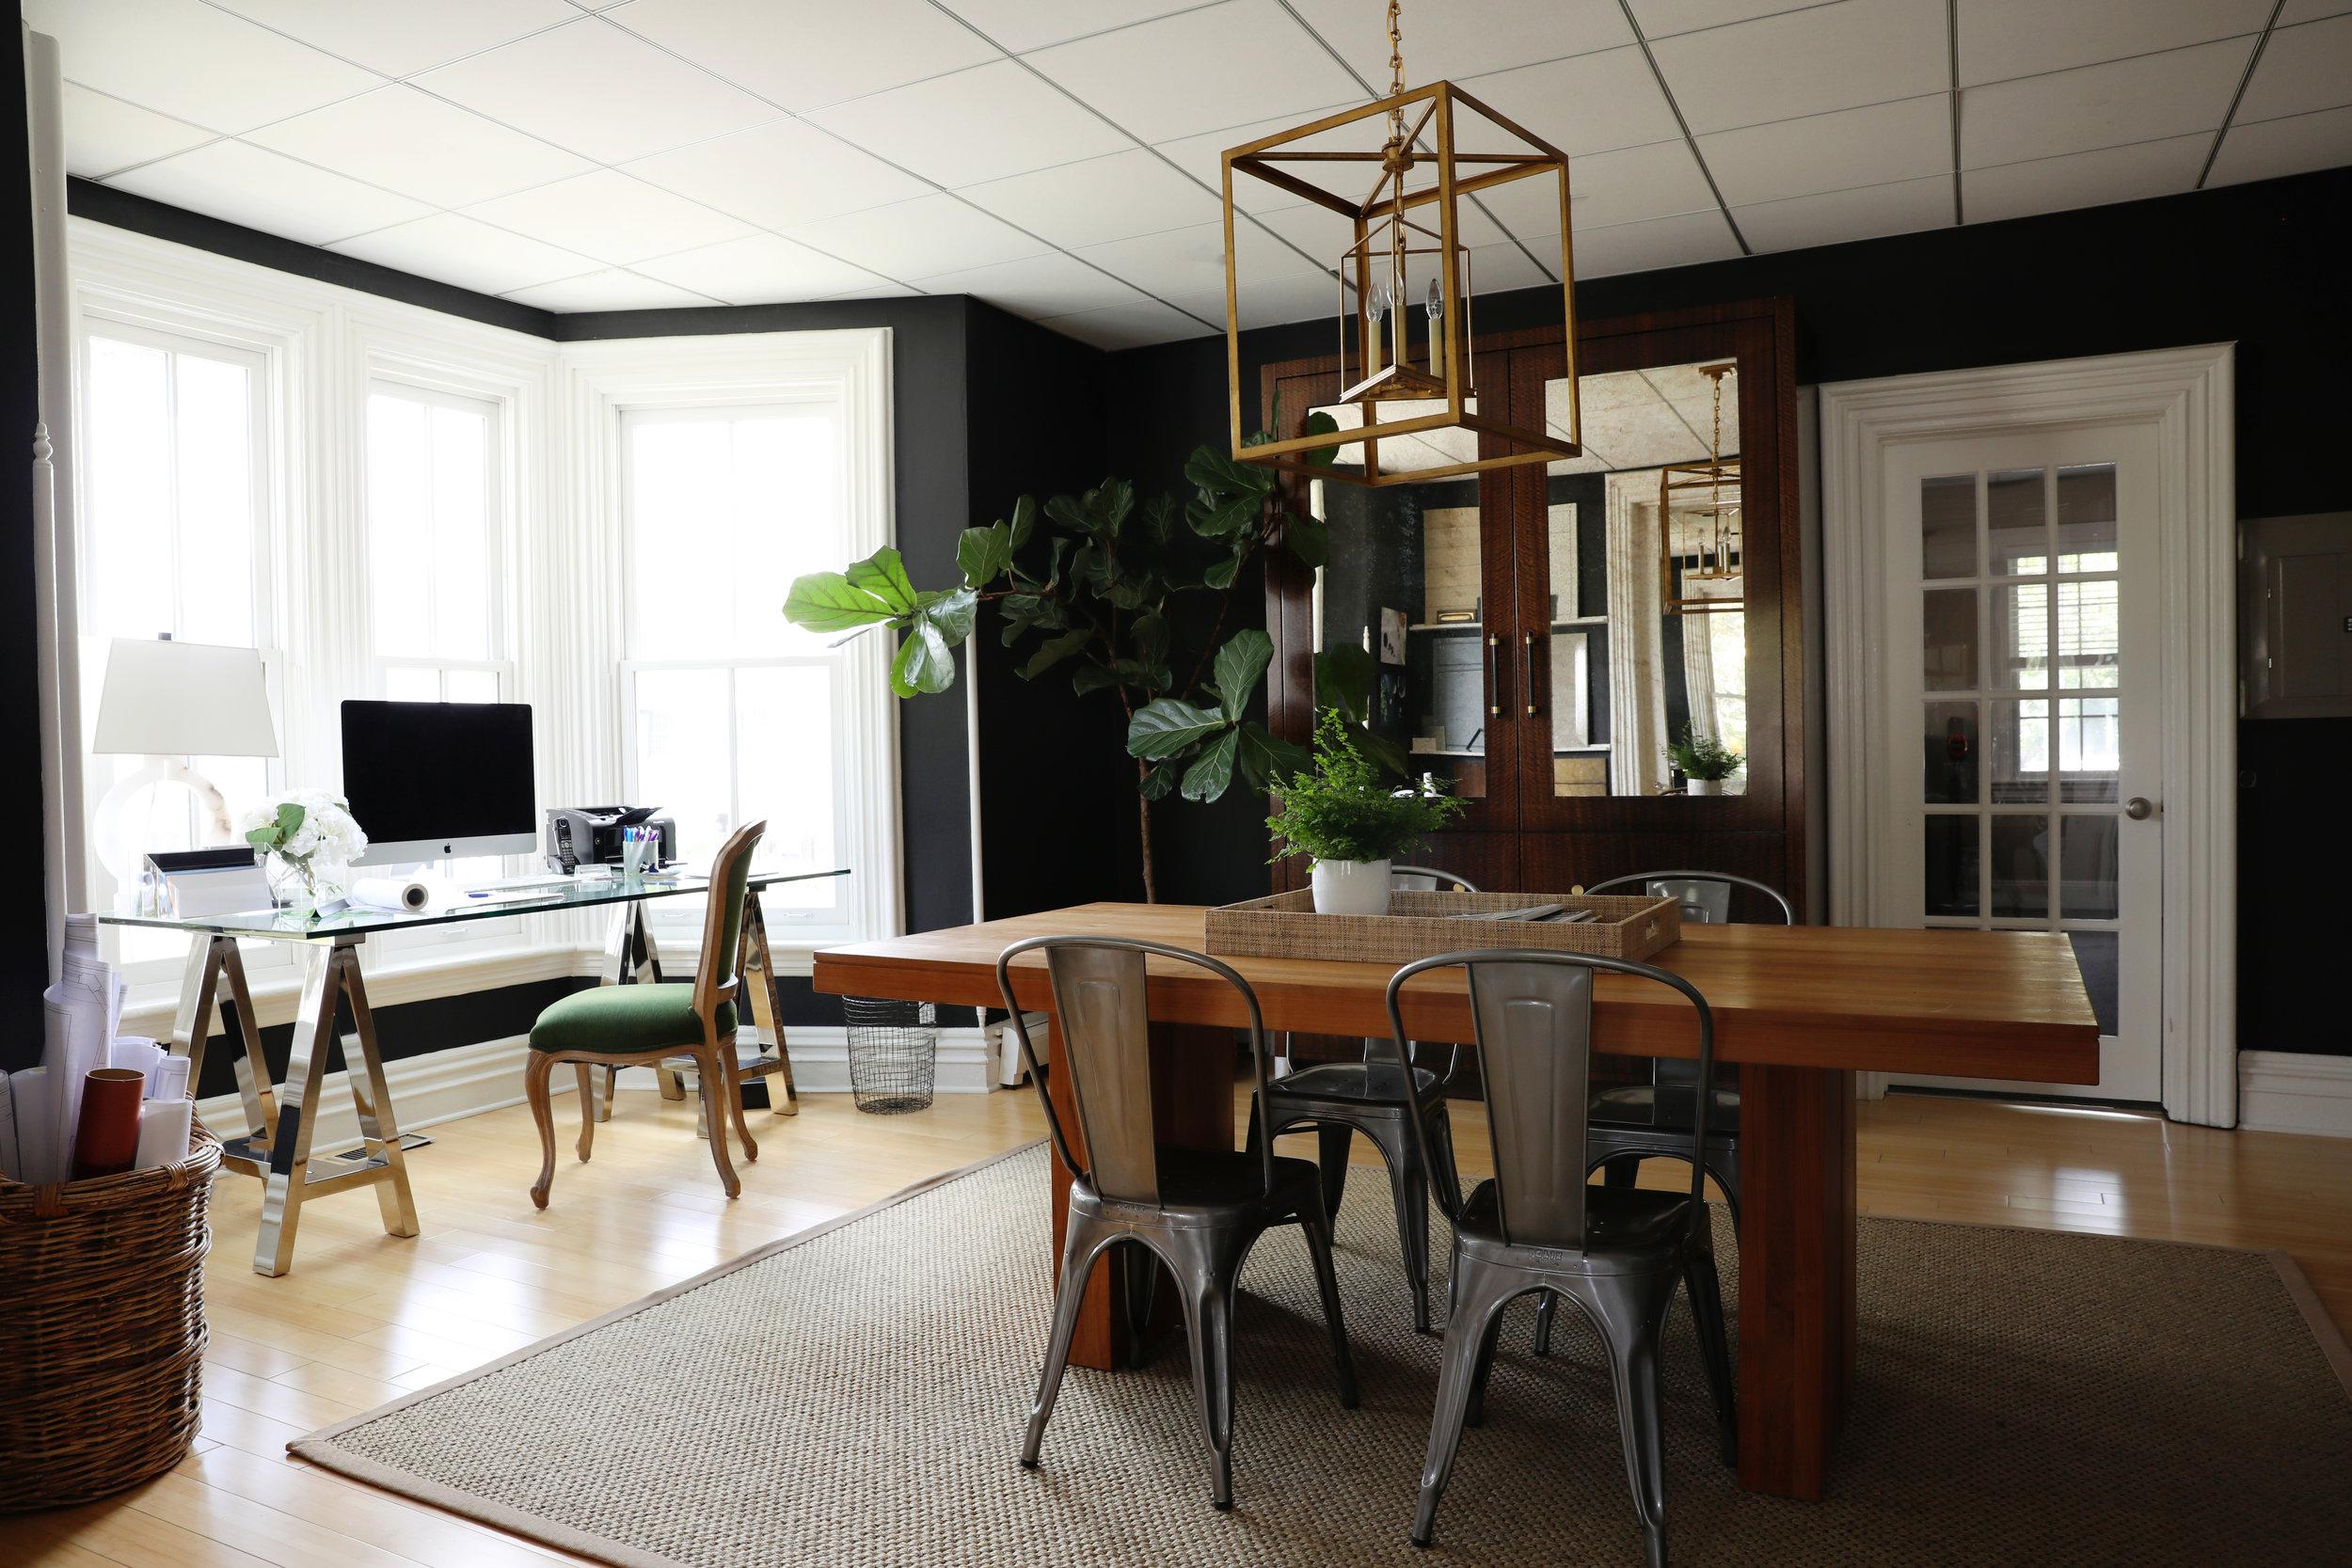 Heidi Piron Design and Cabinetry  |  Chatham, NJ Interior Design Photographer